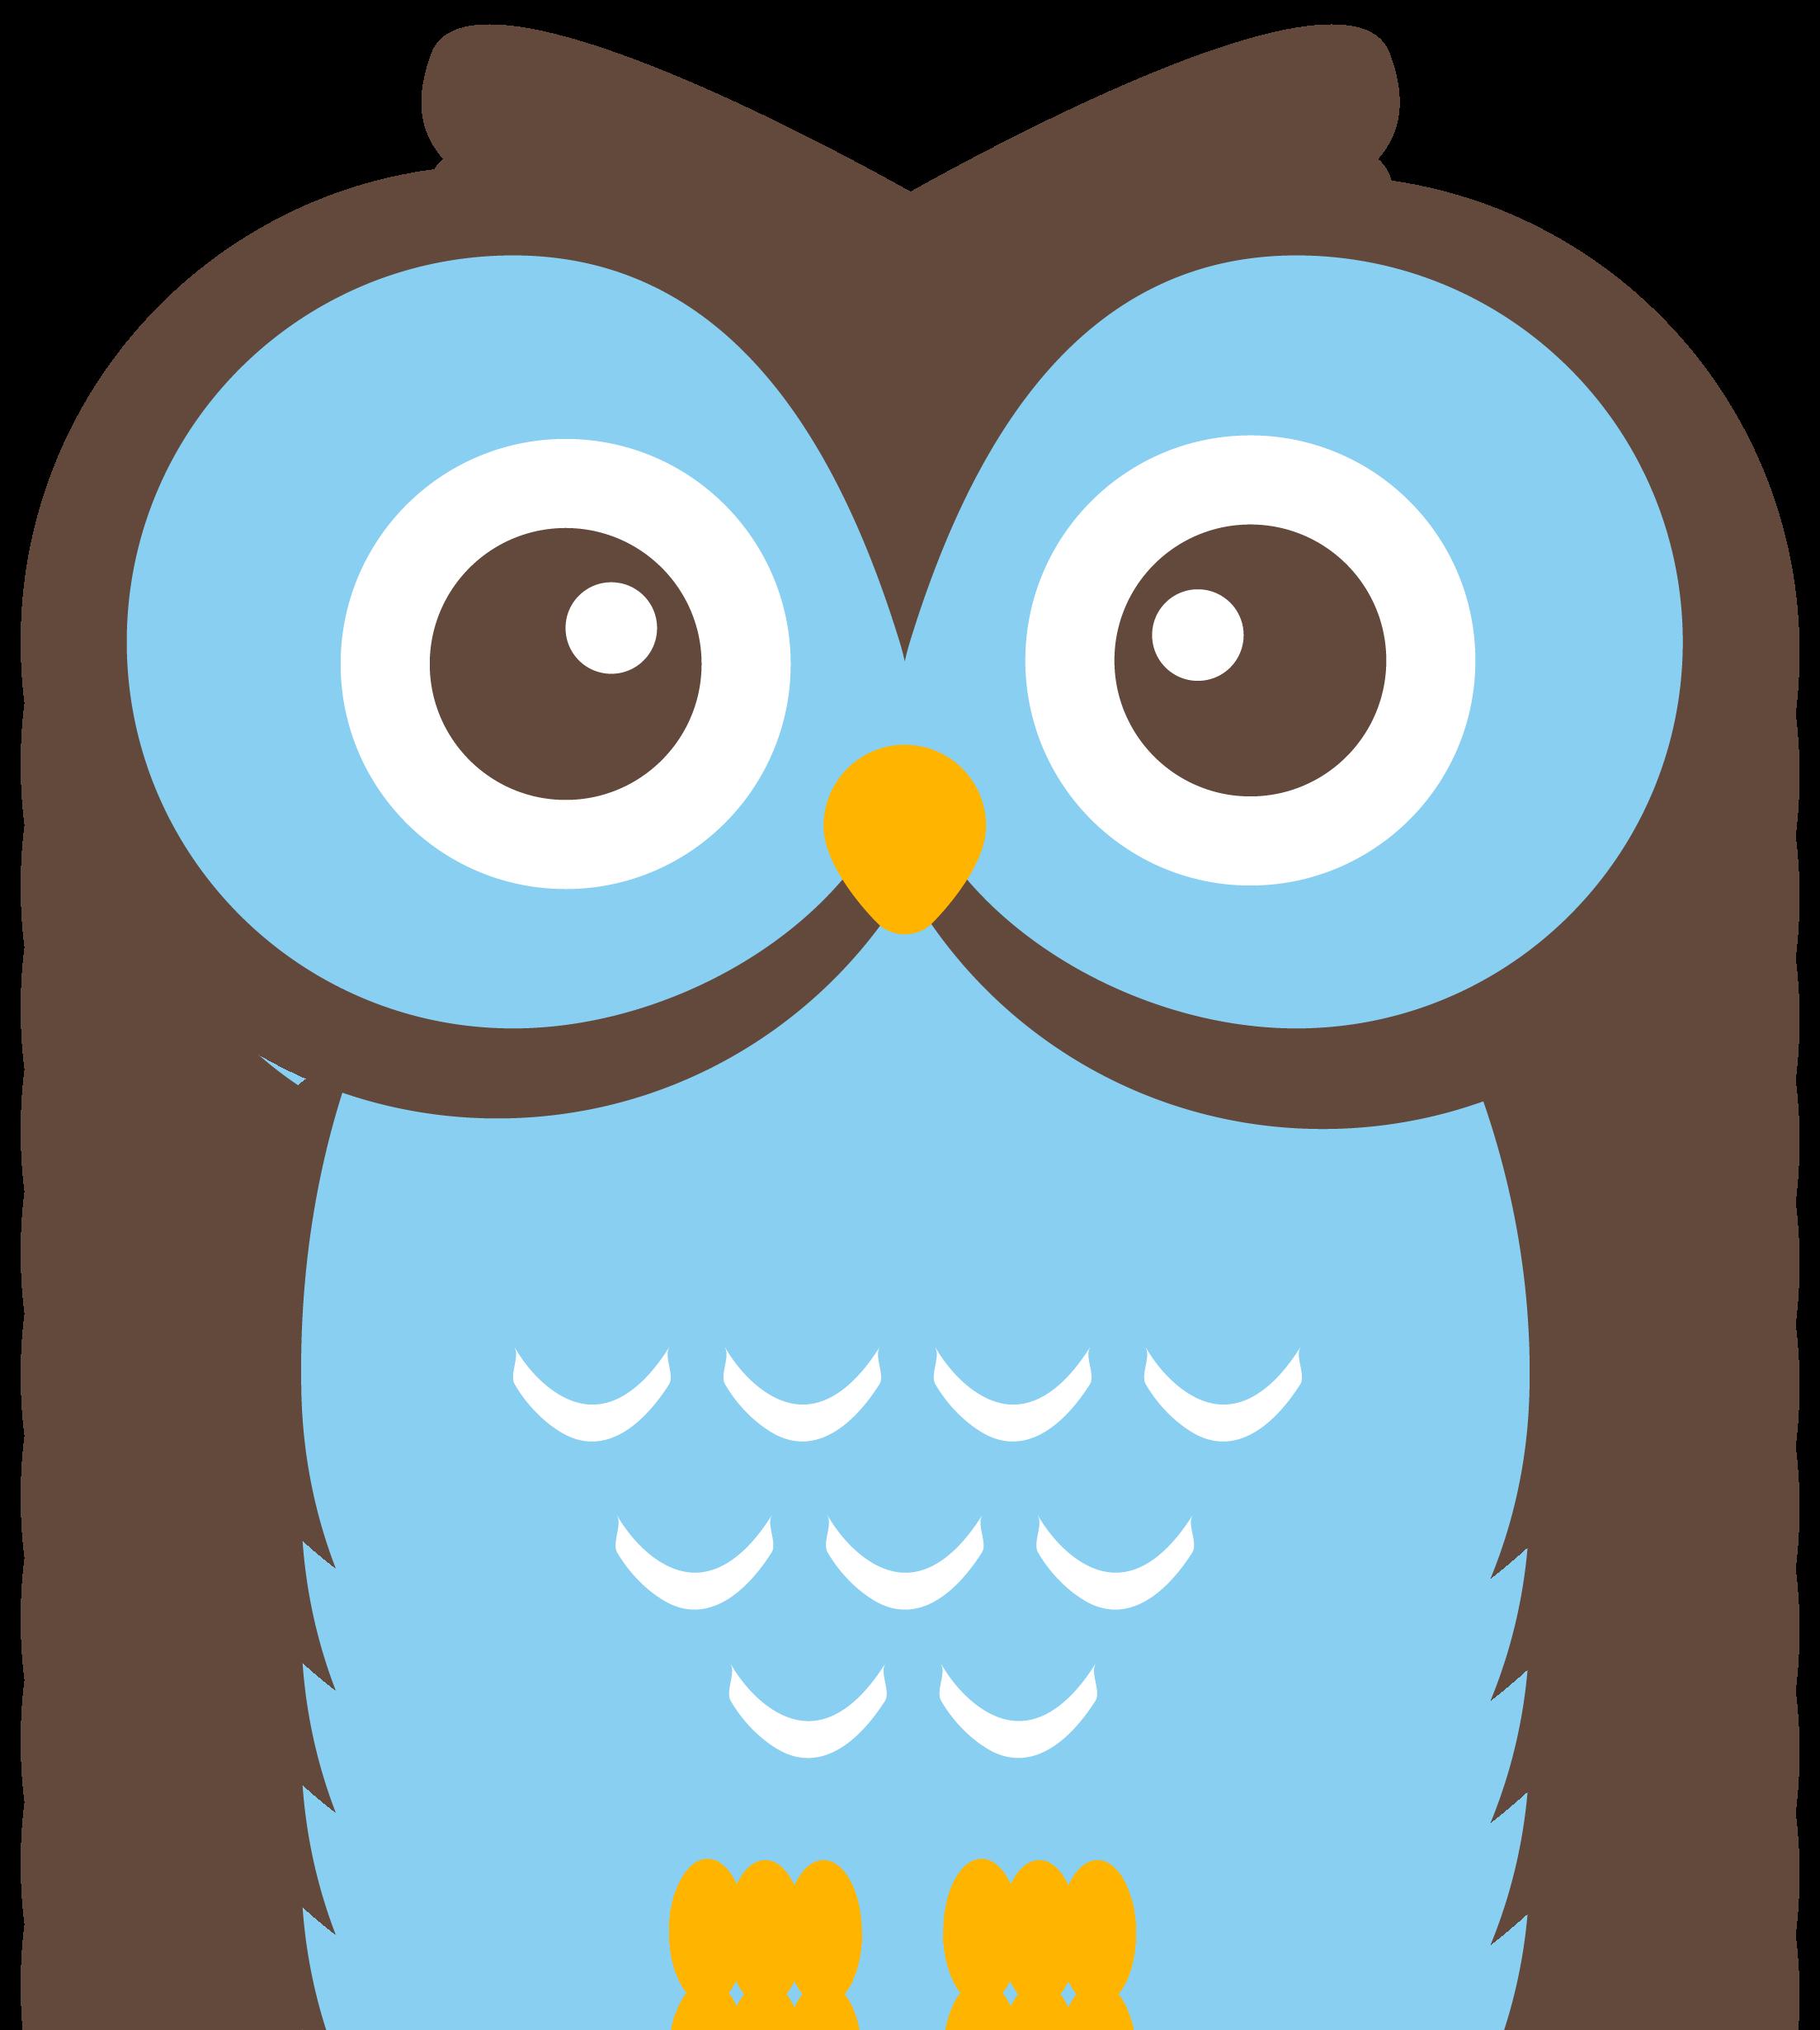 Free Cartoon Owl Clipart Image-Free cartoon owl clipart image-5